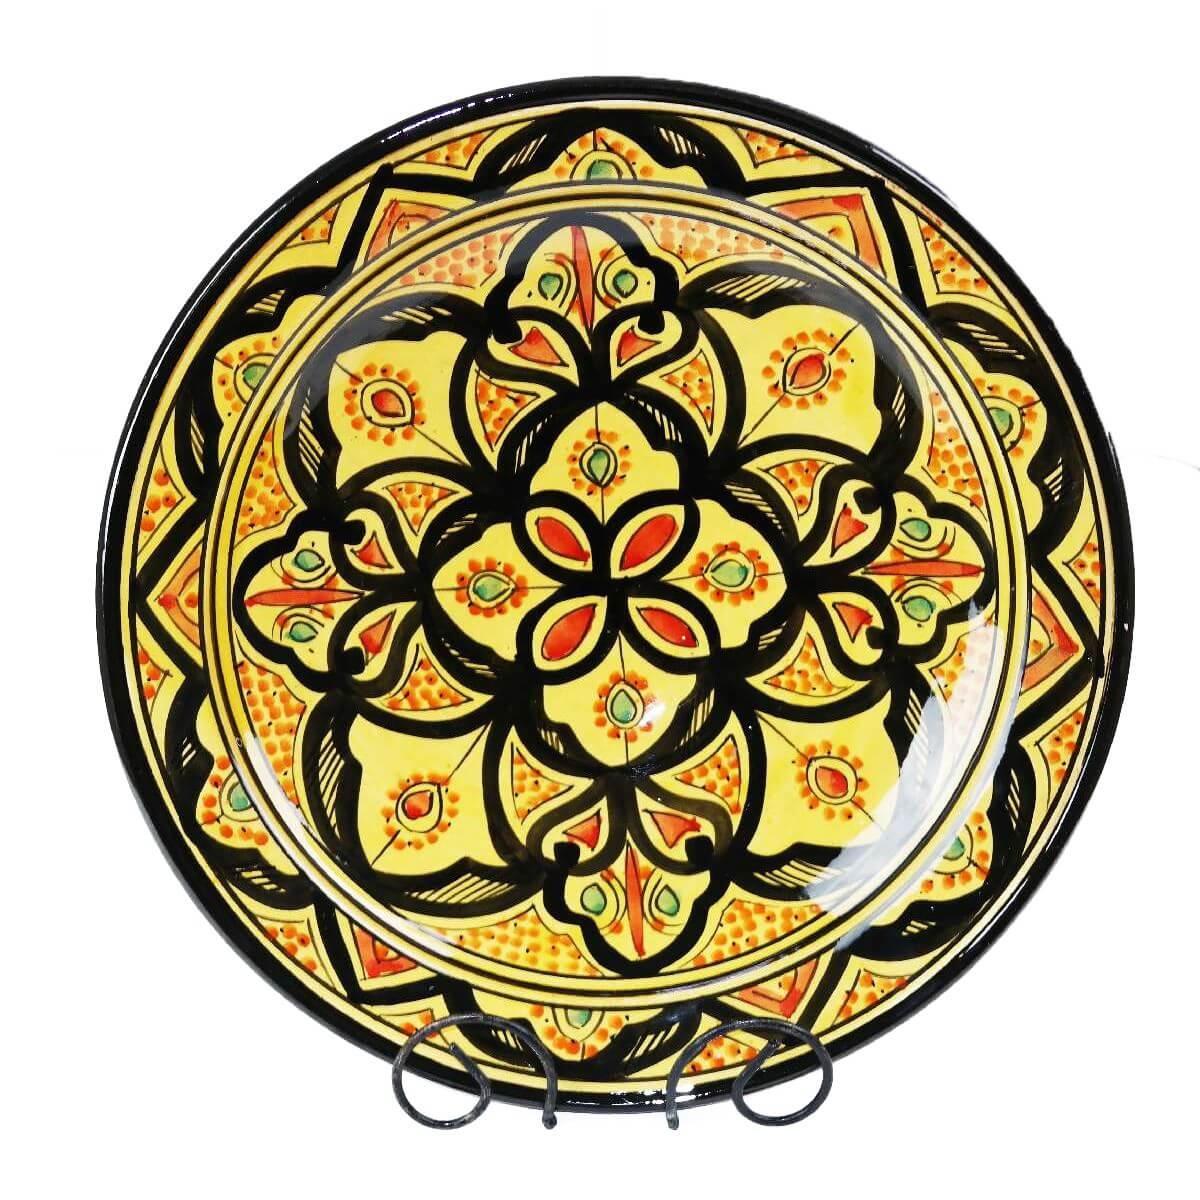 orientalischer keramik teller deko schale handbemalt marokkanisch wandteller gr ebay. Black Bedroom Furniture Sets. Home Design Ideas